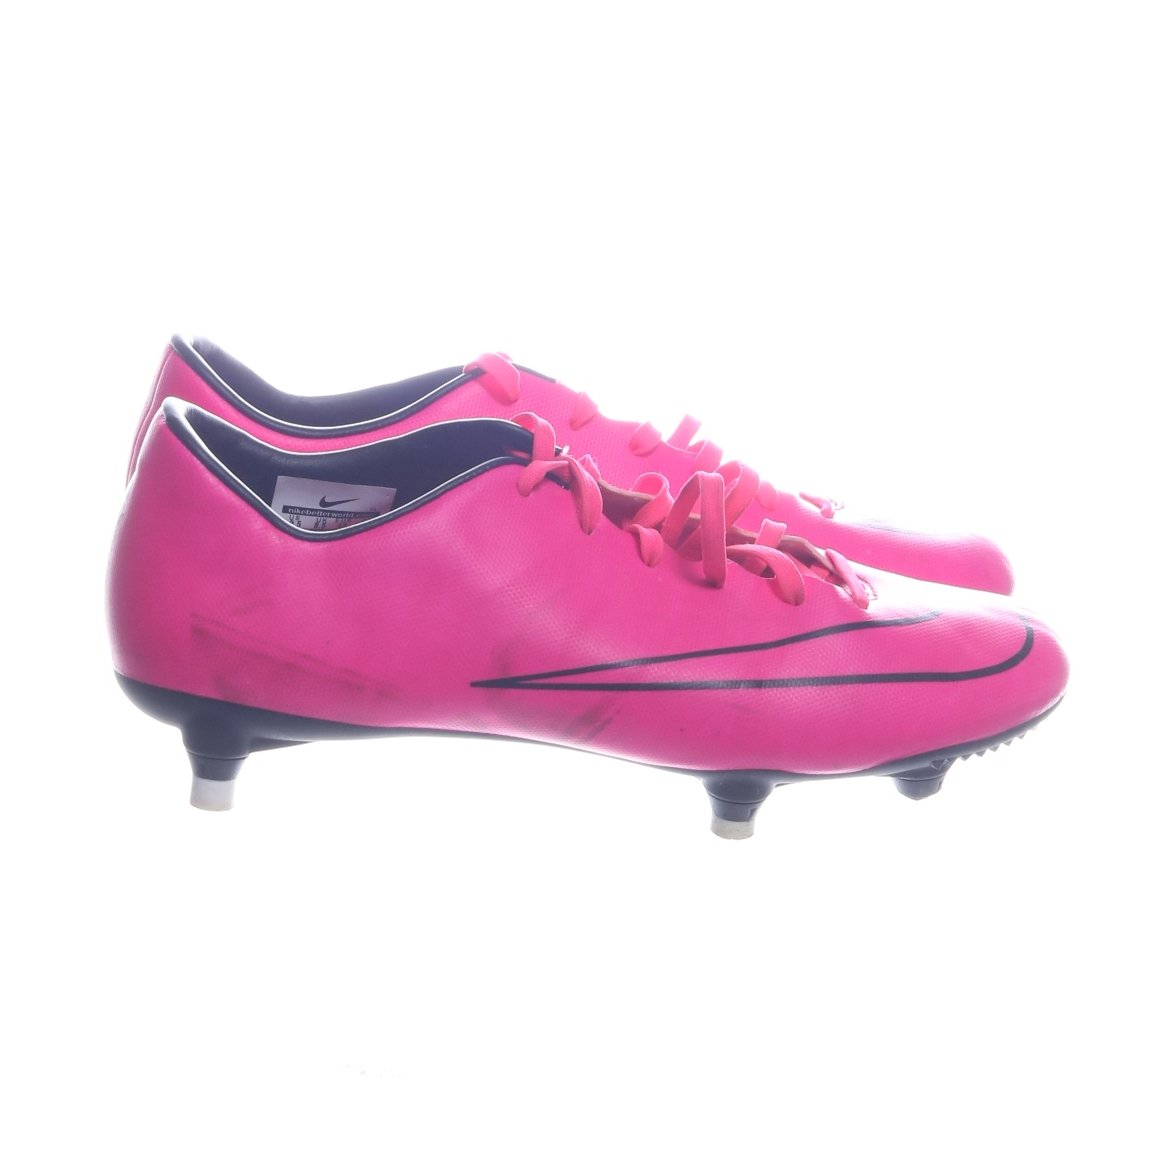 new style 13158 d1fc9 Nike, Fotbollsskor, Strl  43, Mercuruial, Rosa Svart